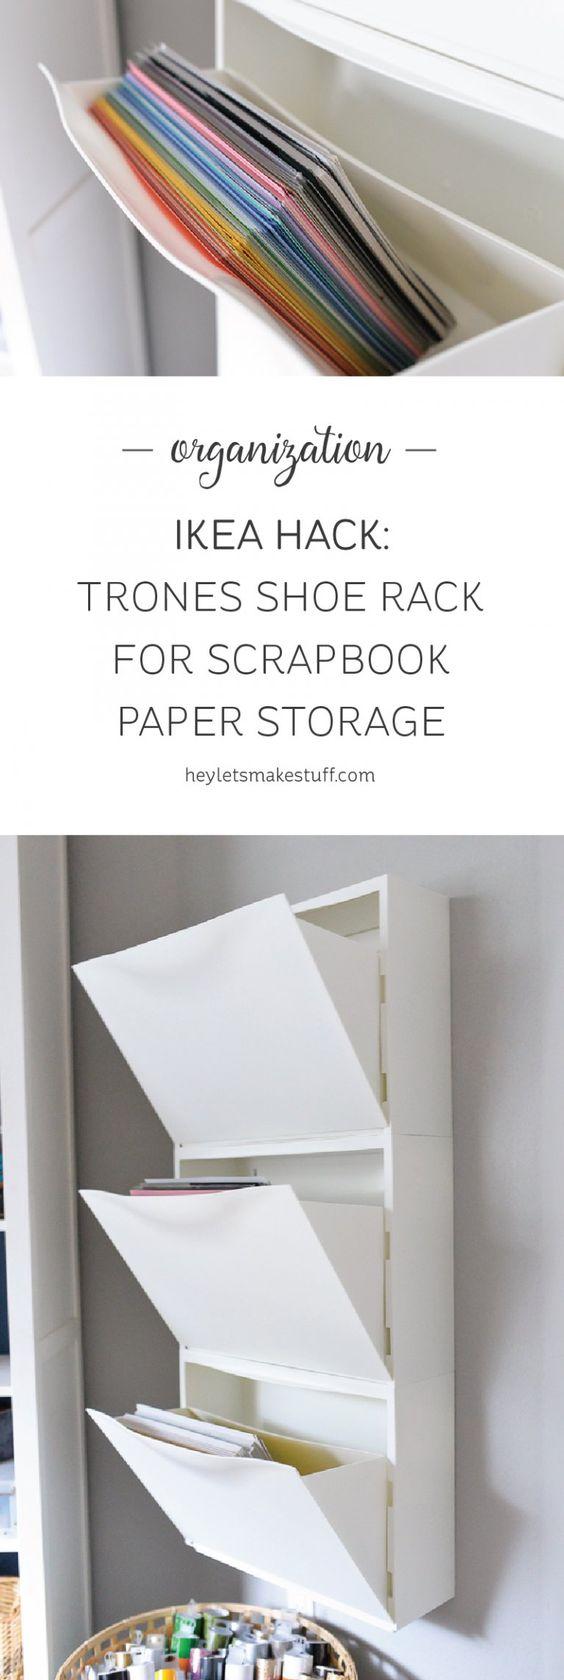 Ikea hack trones shoe holder for paper storage for Ikea paper holder storage